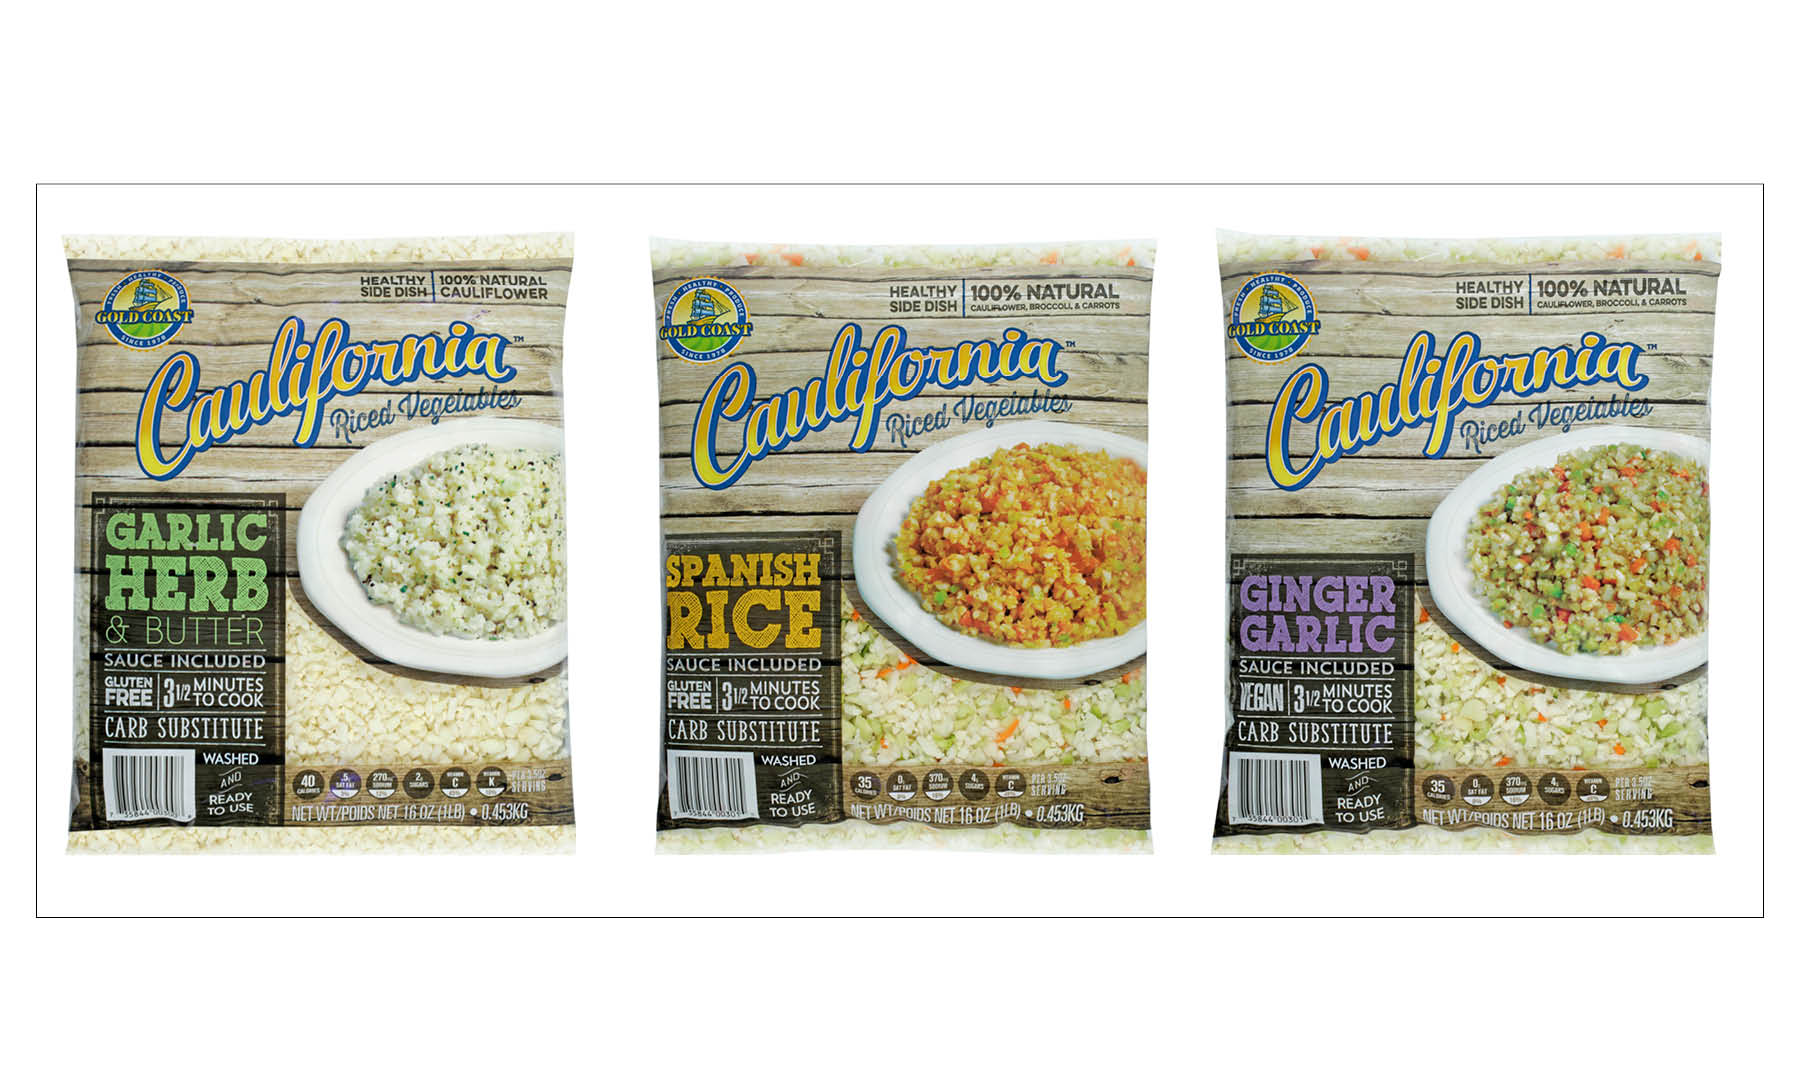 Caulifornia™ Riced Vegetable Sides